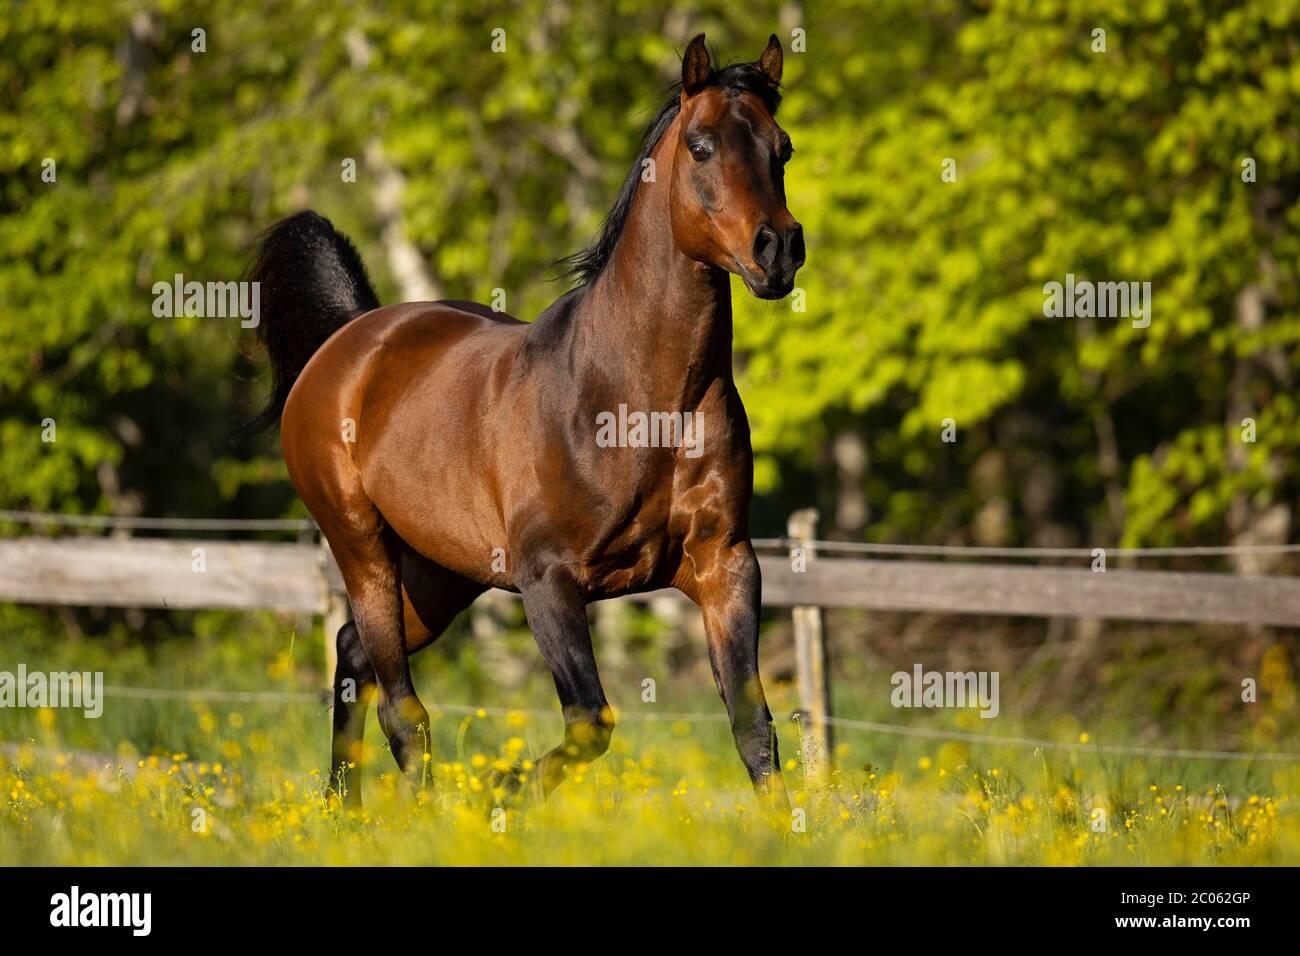 Brown Thoroughbred Arabian Stallion On The Pasture In Spring Tyrol Austria Stock Photo Alamy